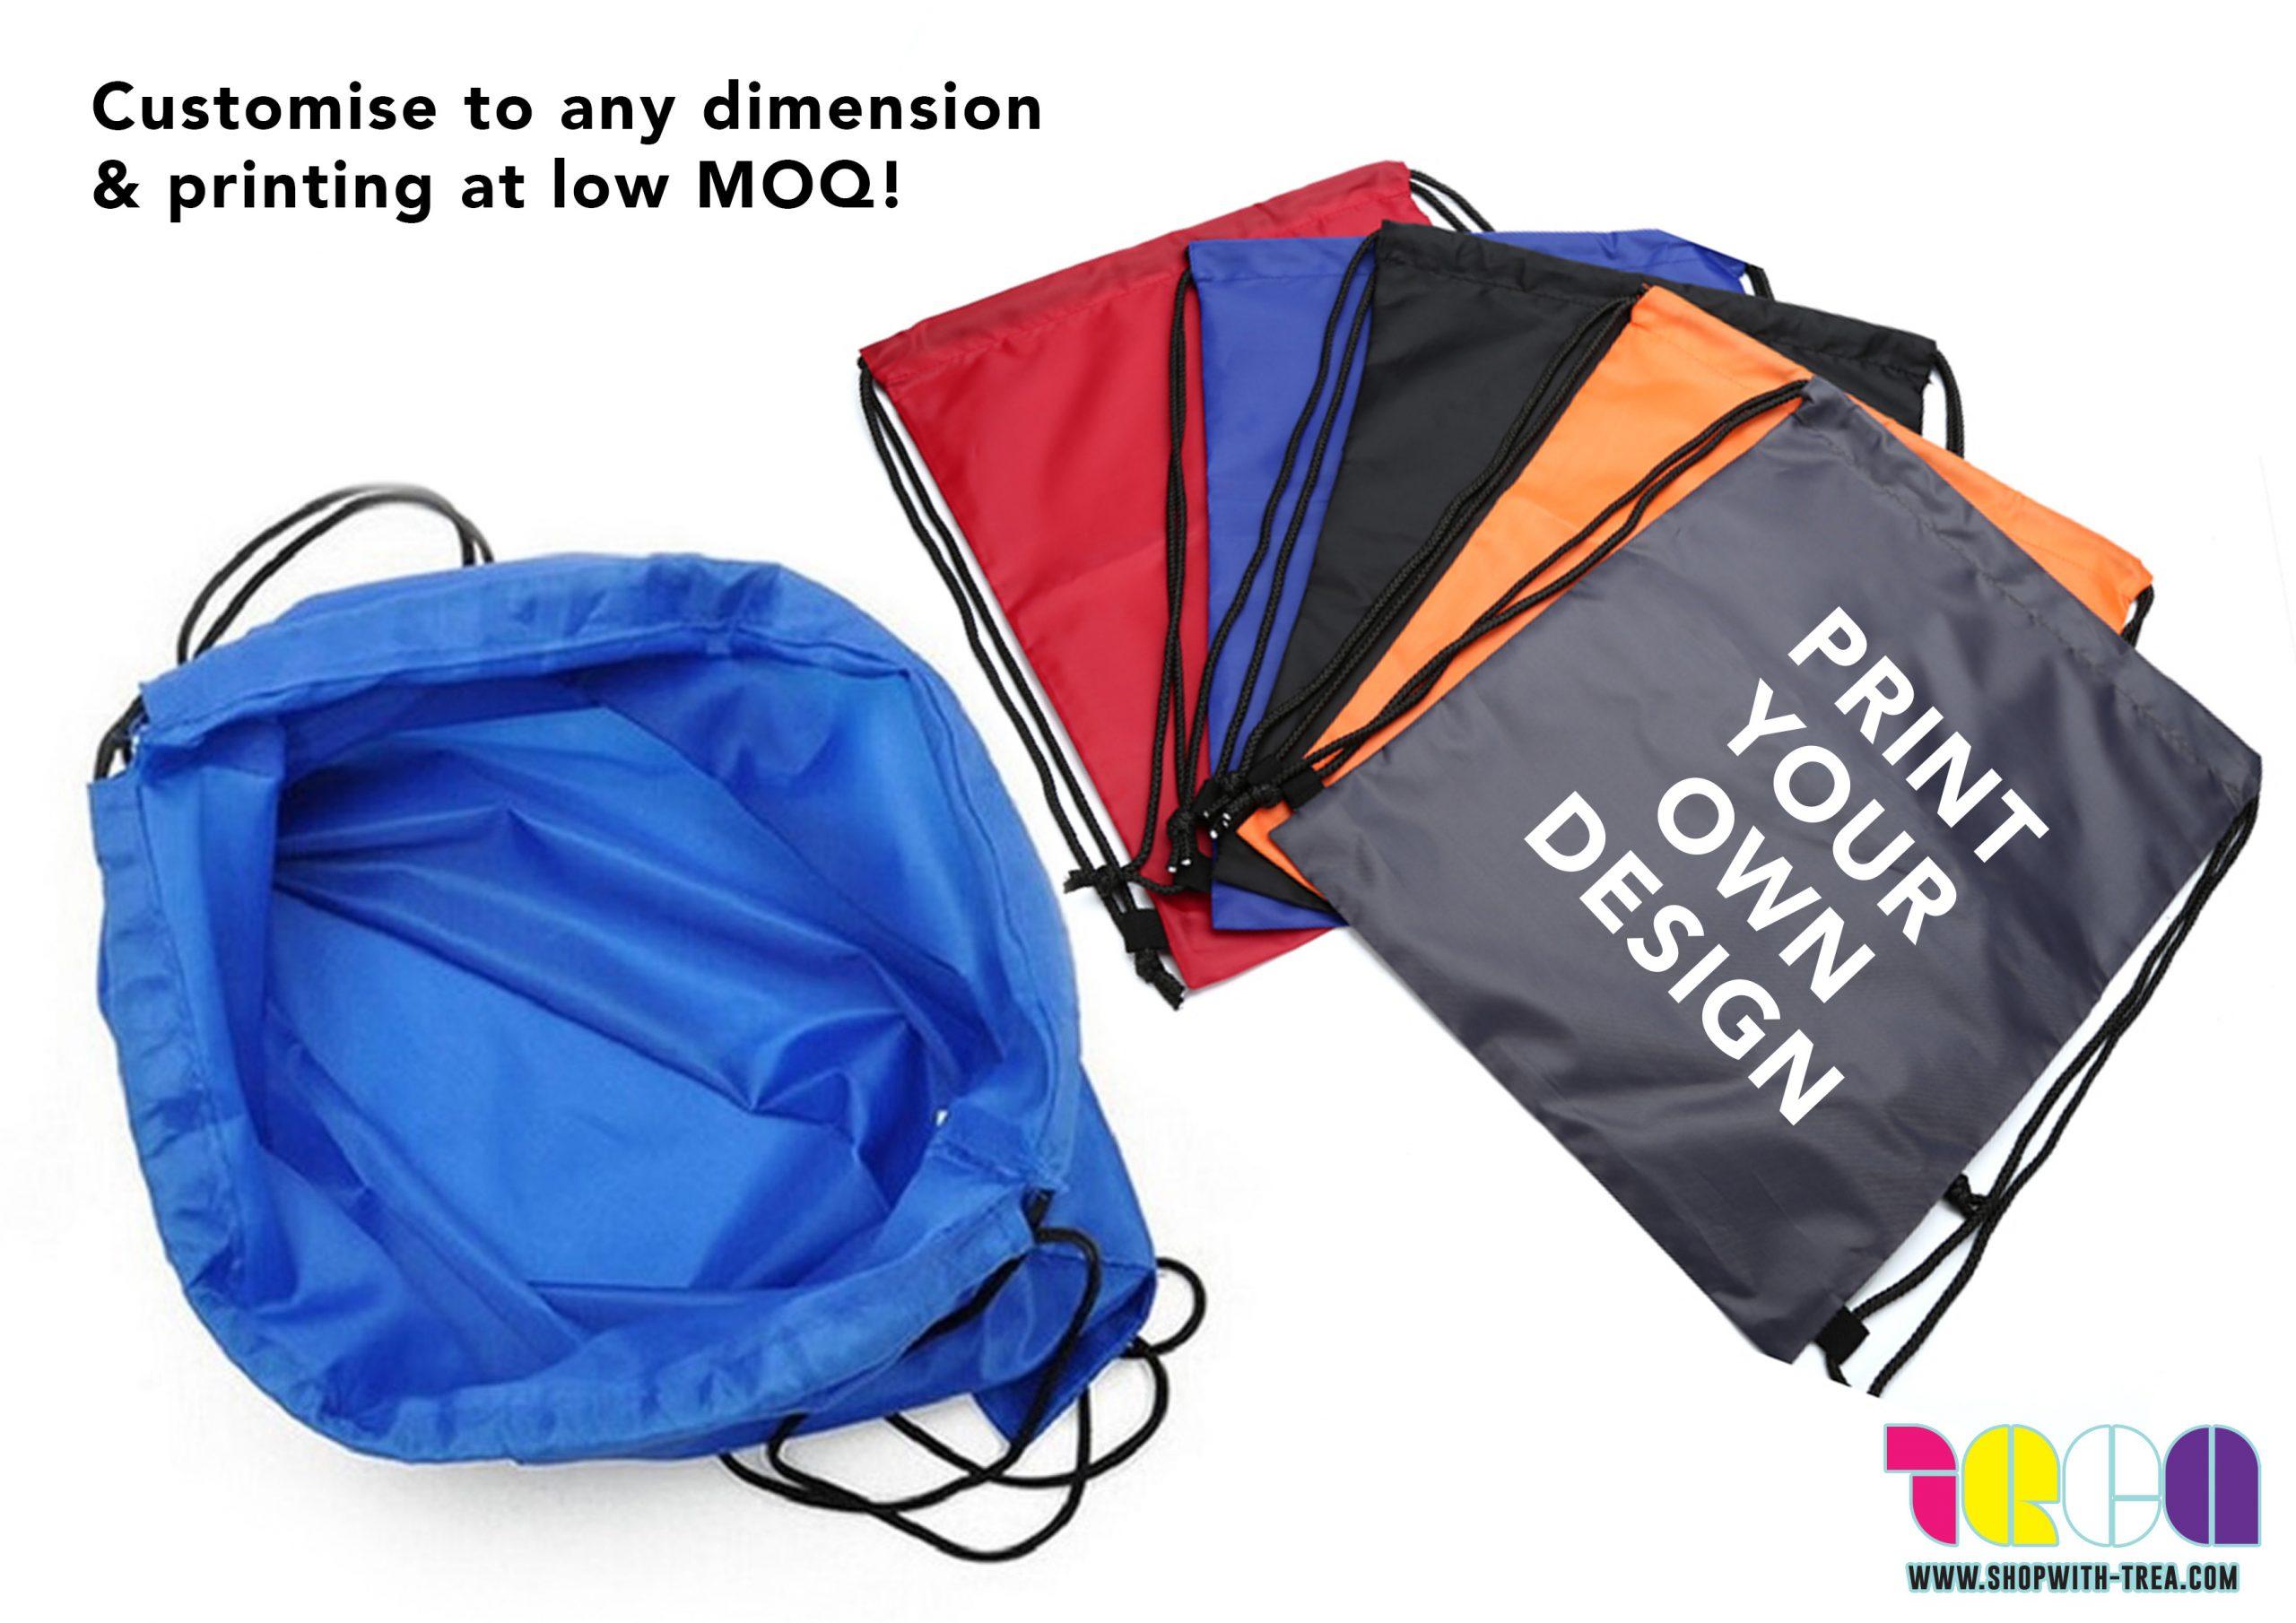 Customise polyester nylon Drawstring bag